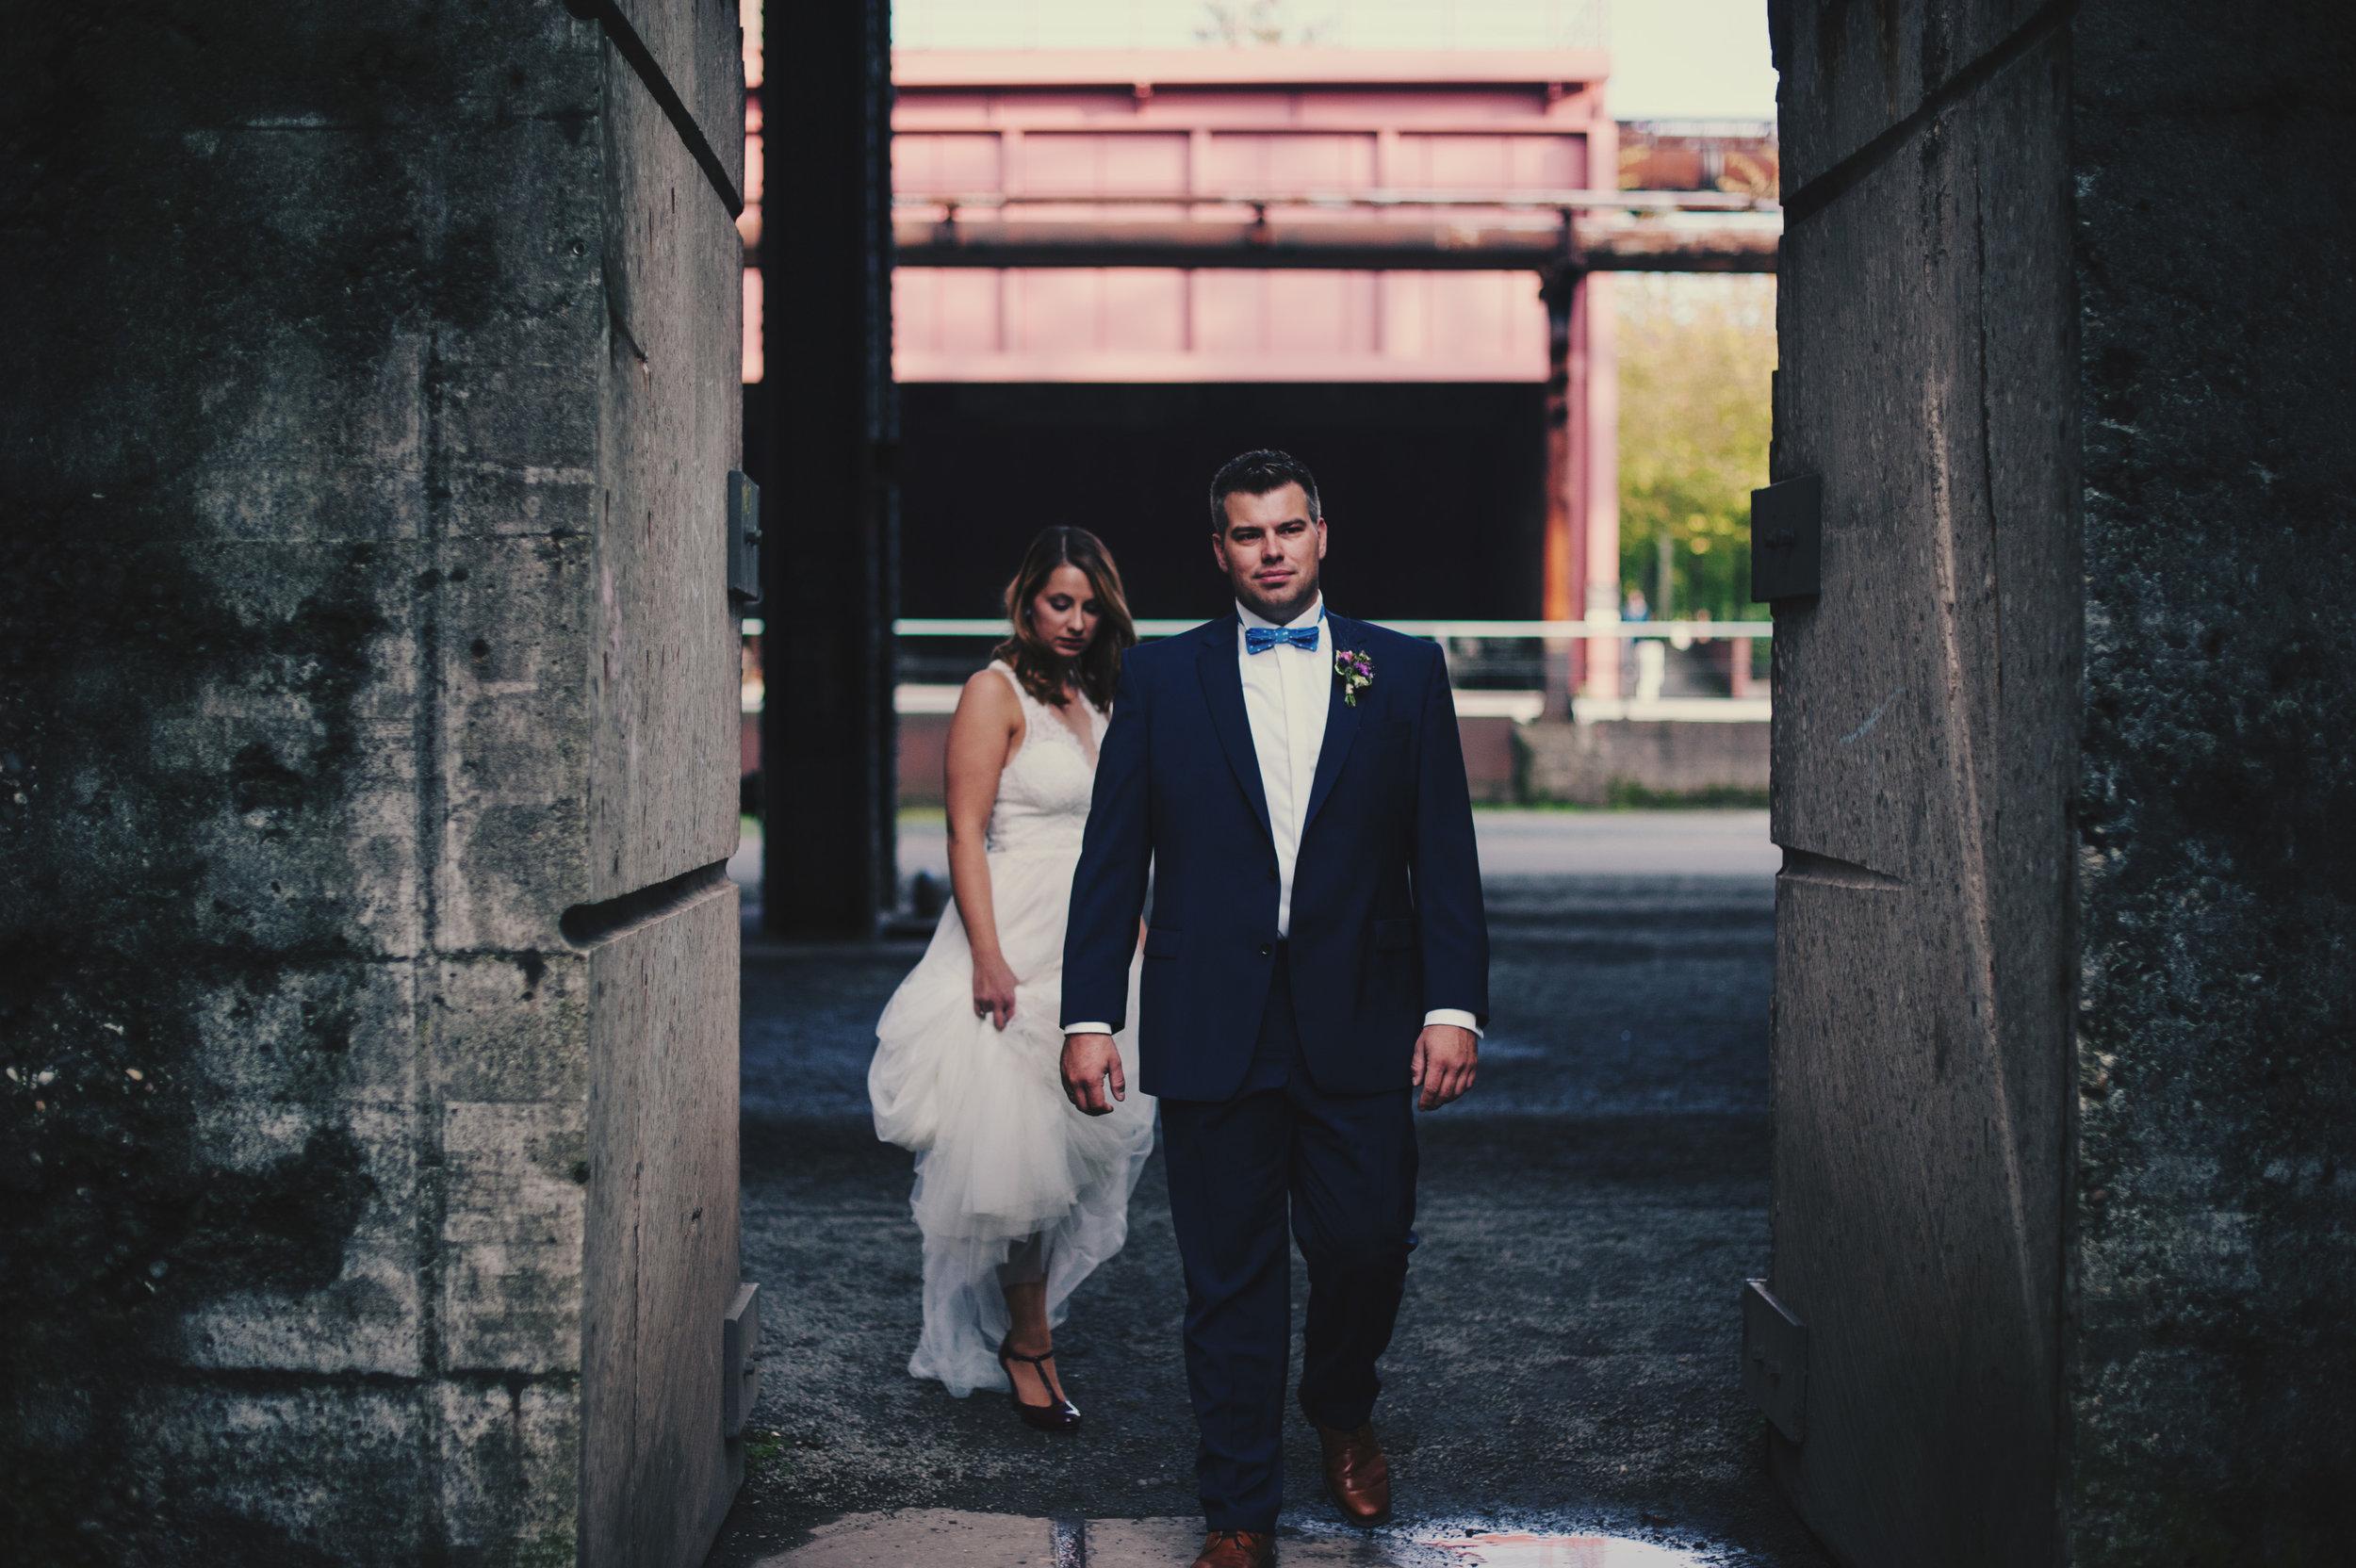 after-wedding-landschaftspark-duisburg-industrial-shooting-wasser-7.jpg